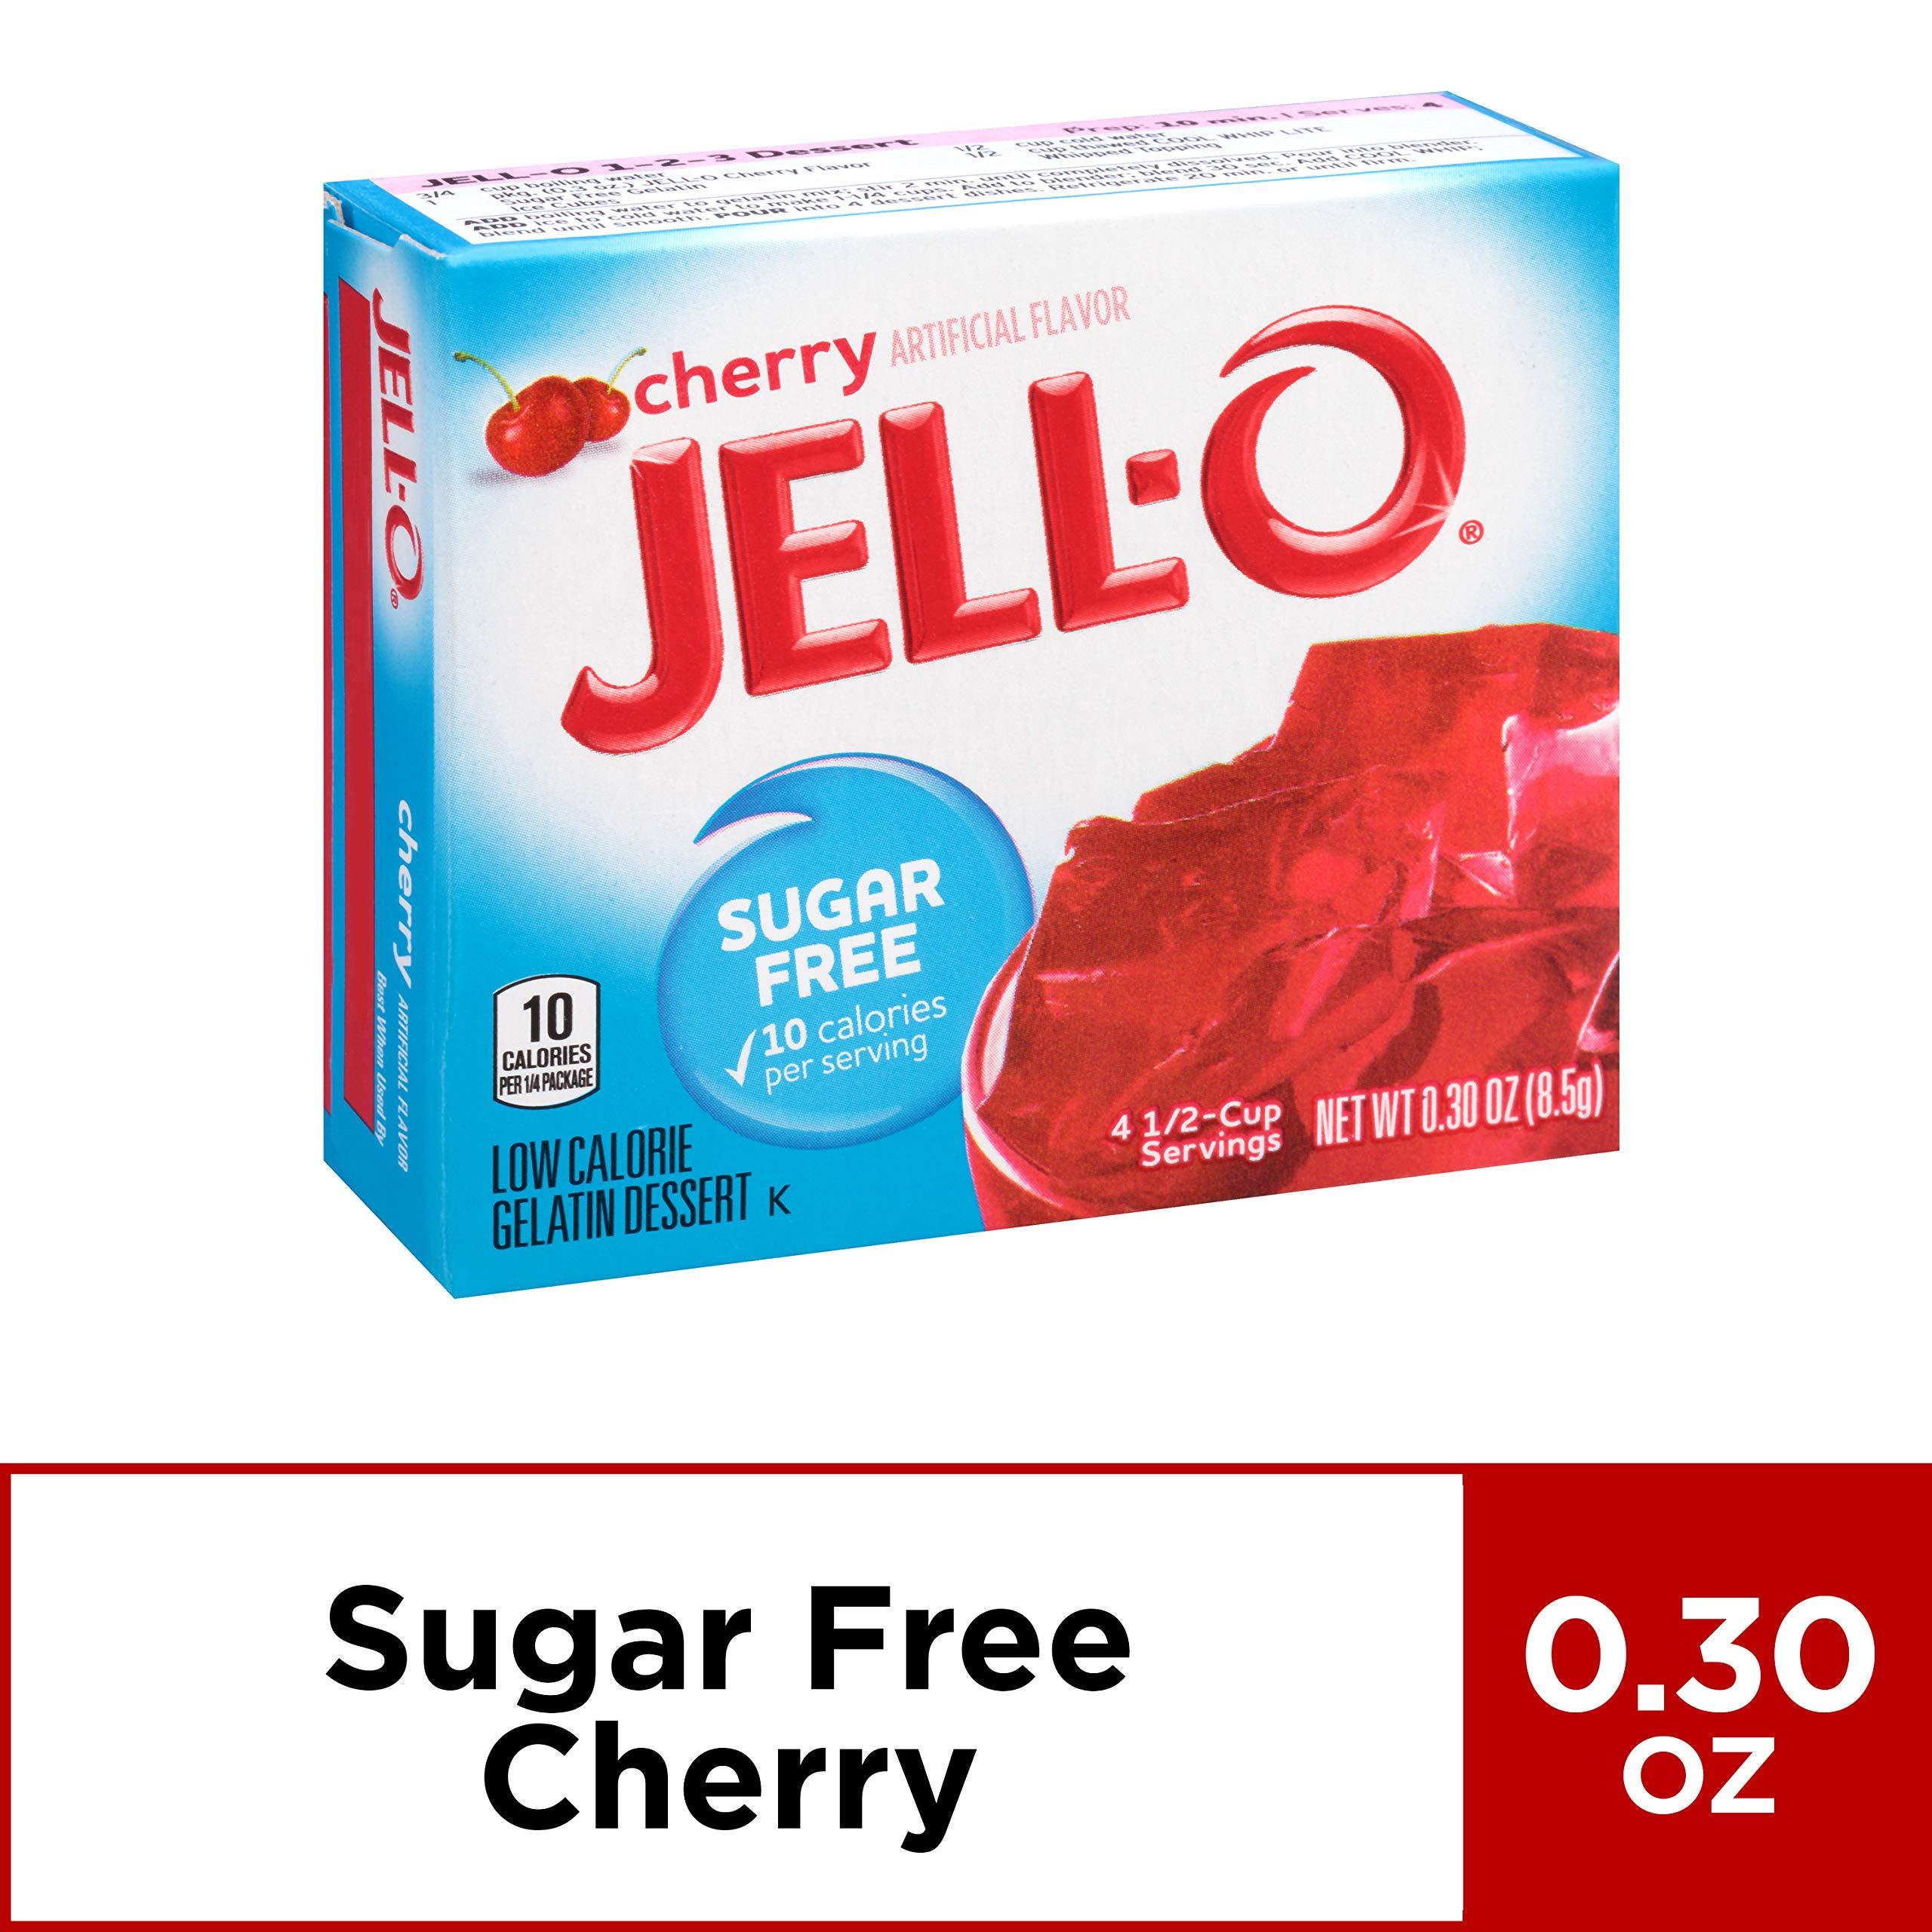 JELL-O Cherry Sugar Free Gelatin Dessert Mix (0.30 oz Boxes, Pack of 24)